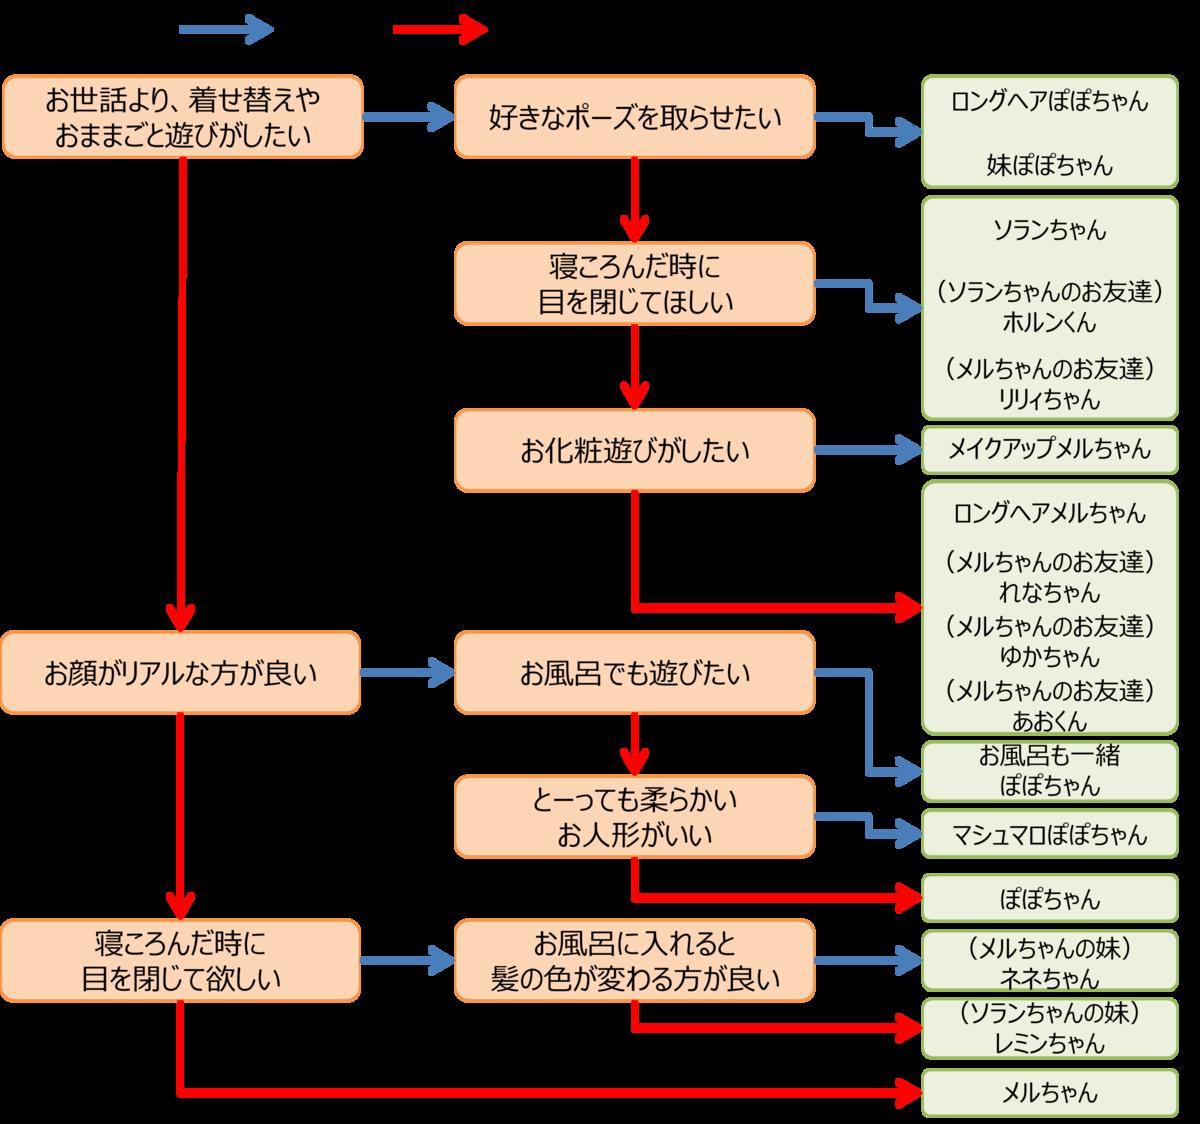 f:id:piyobu:20200702145746p:plain